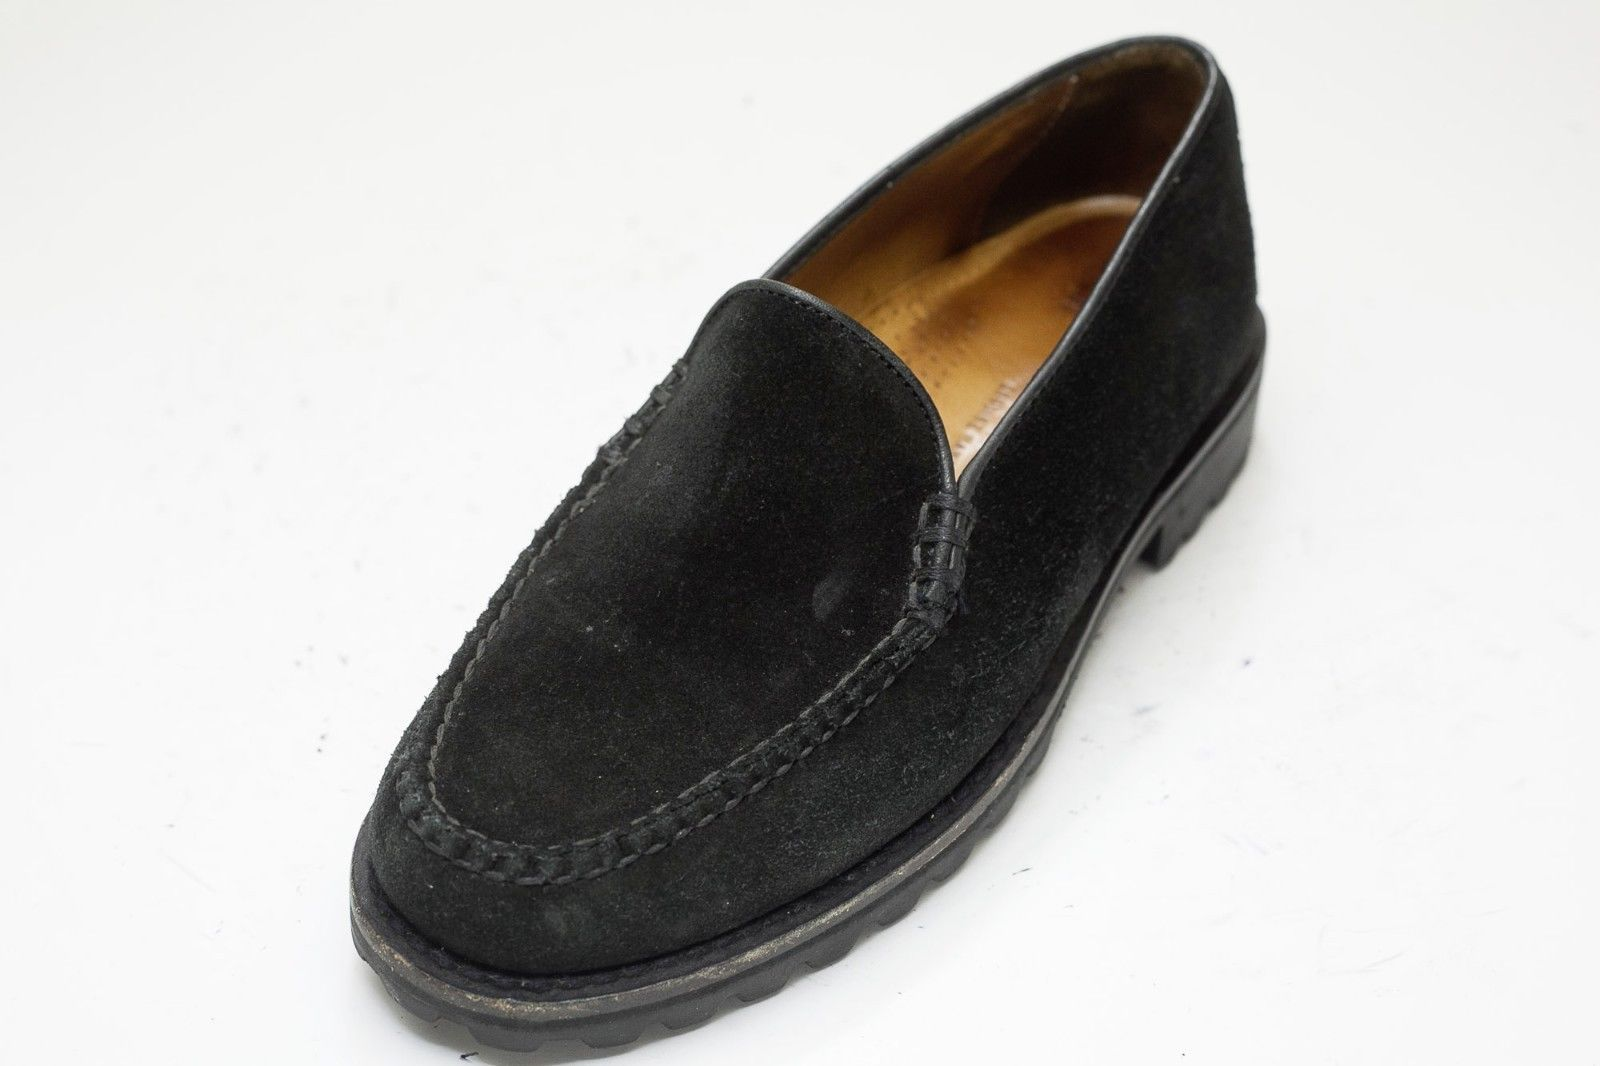 Cole Haan 6 Black Suede Slip On Loafer Women's image 3